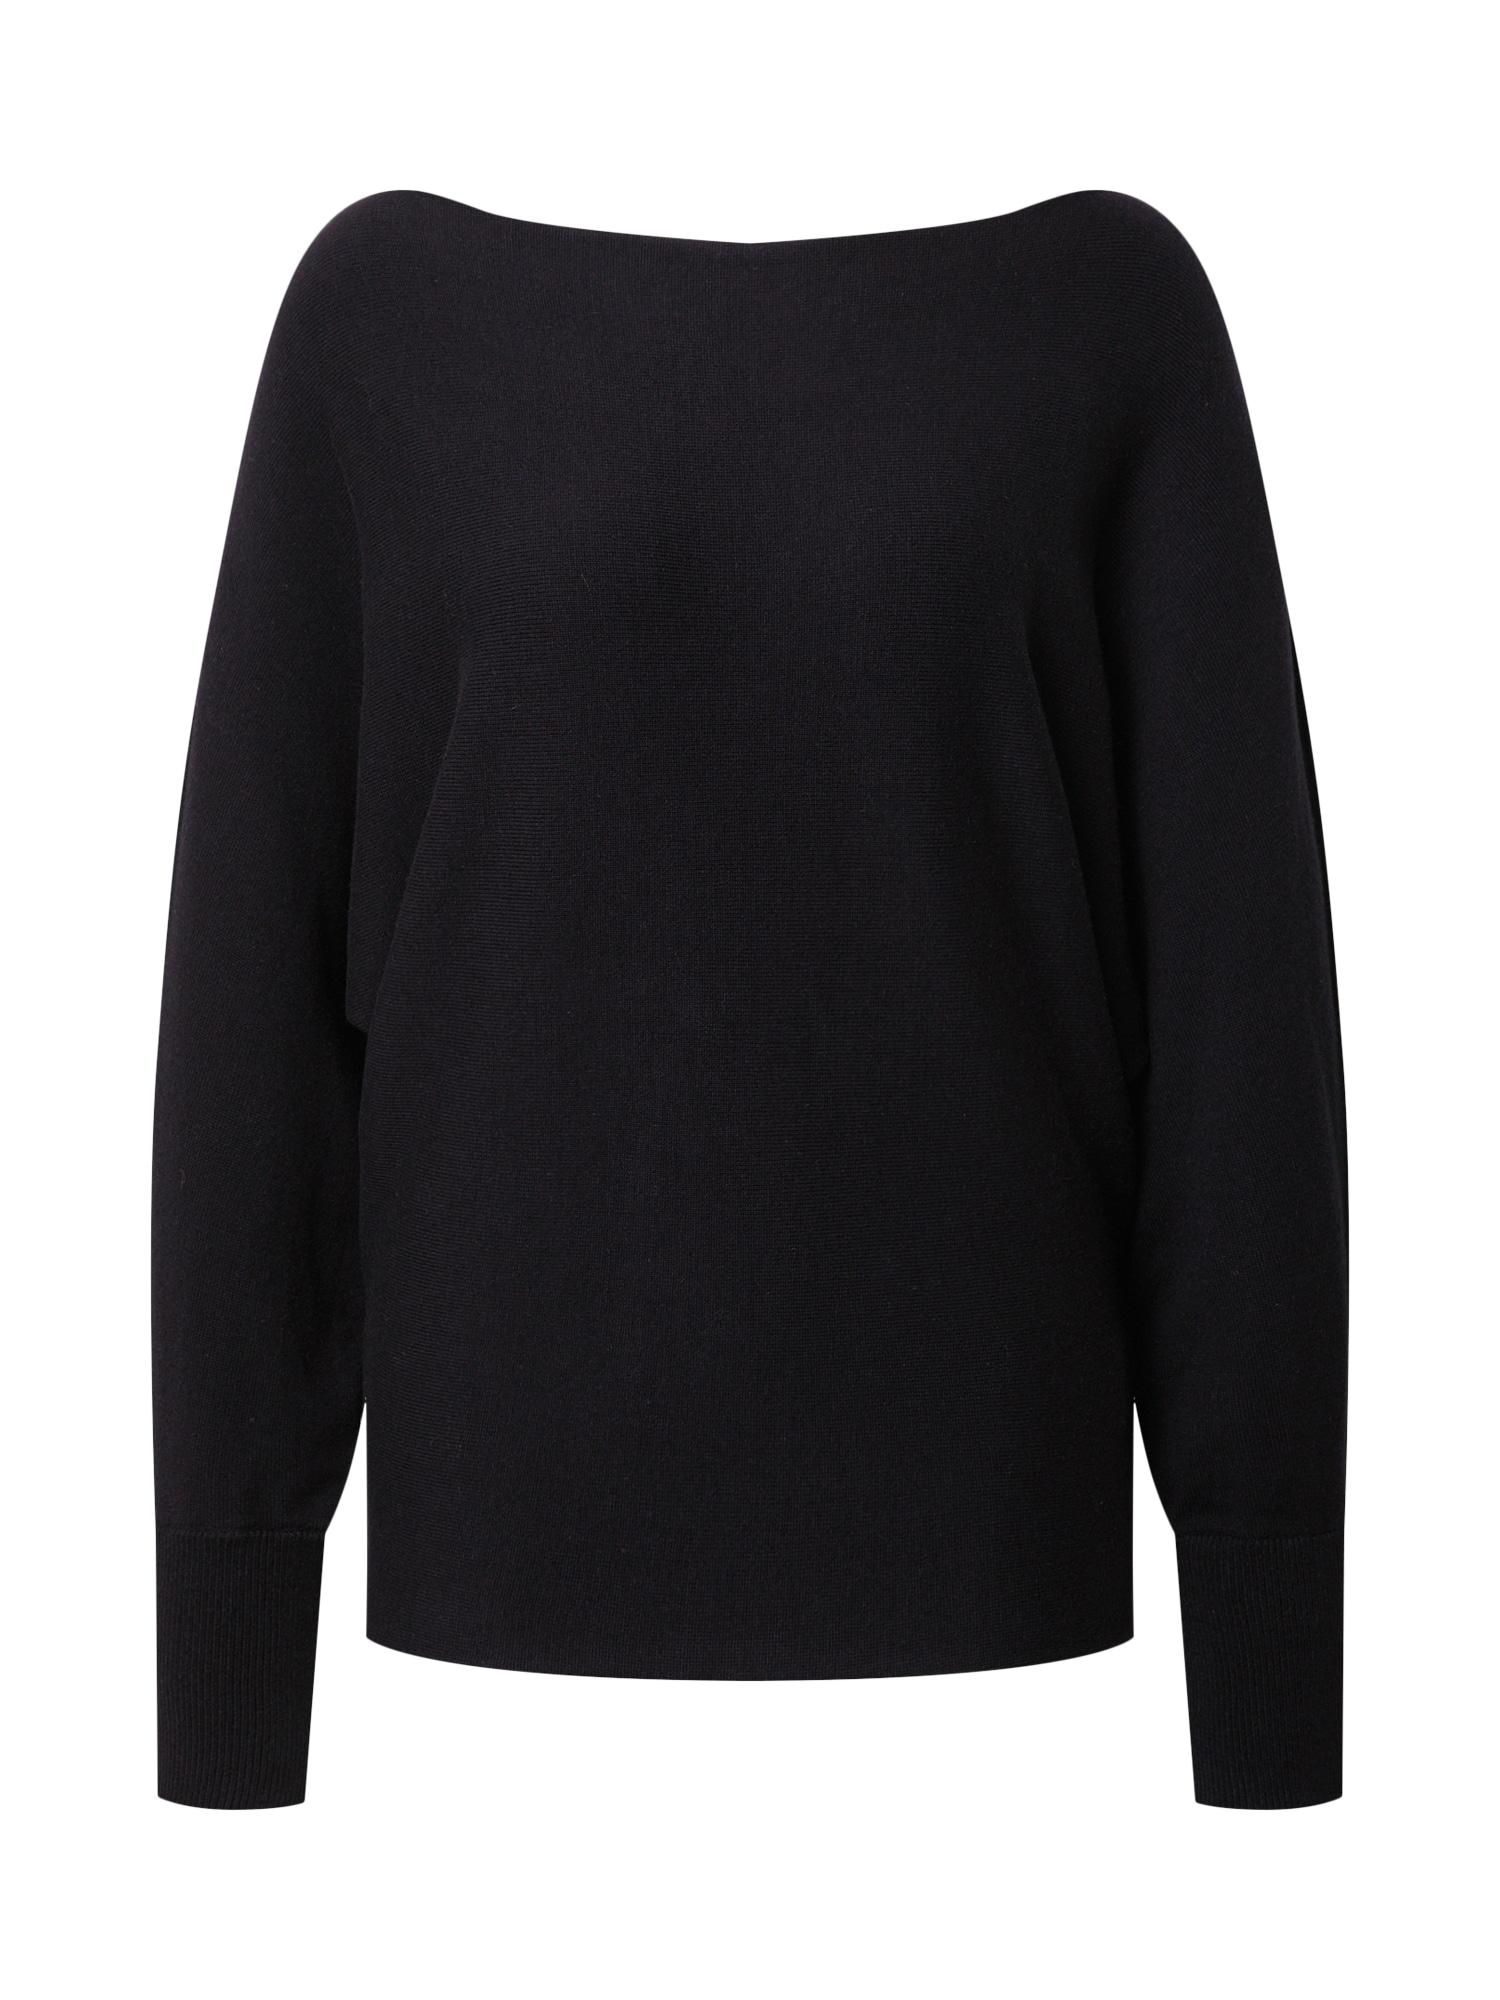 CATWALK JUNKIE Megztinis juoda